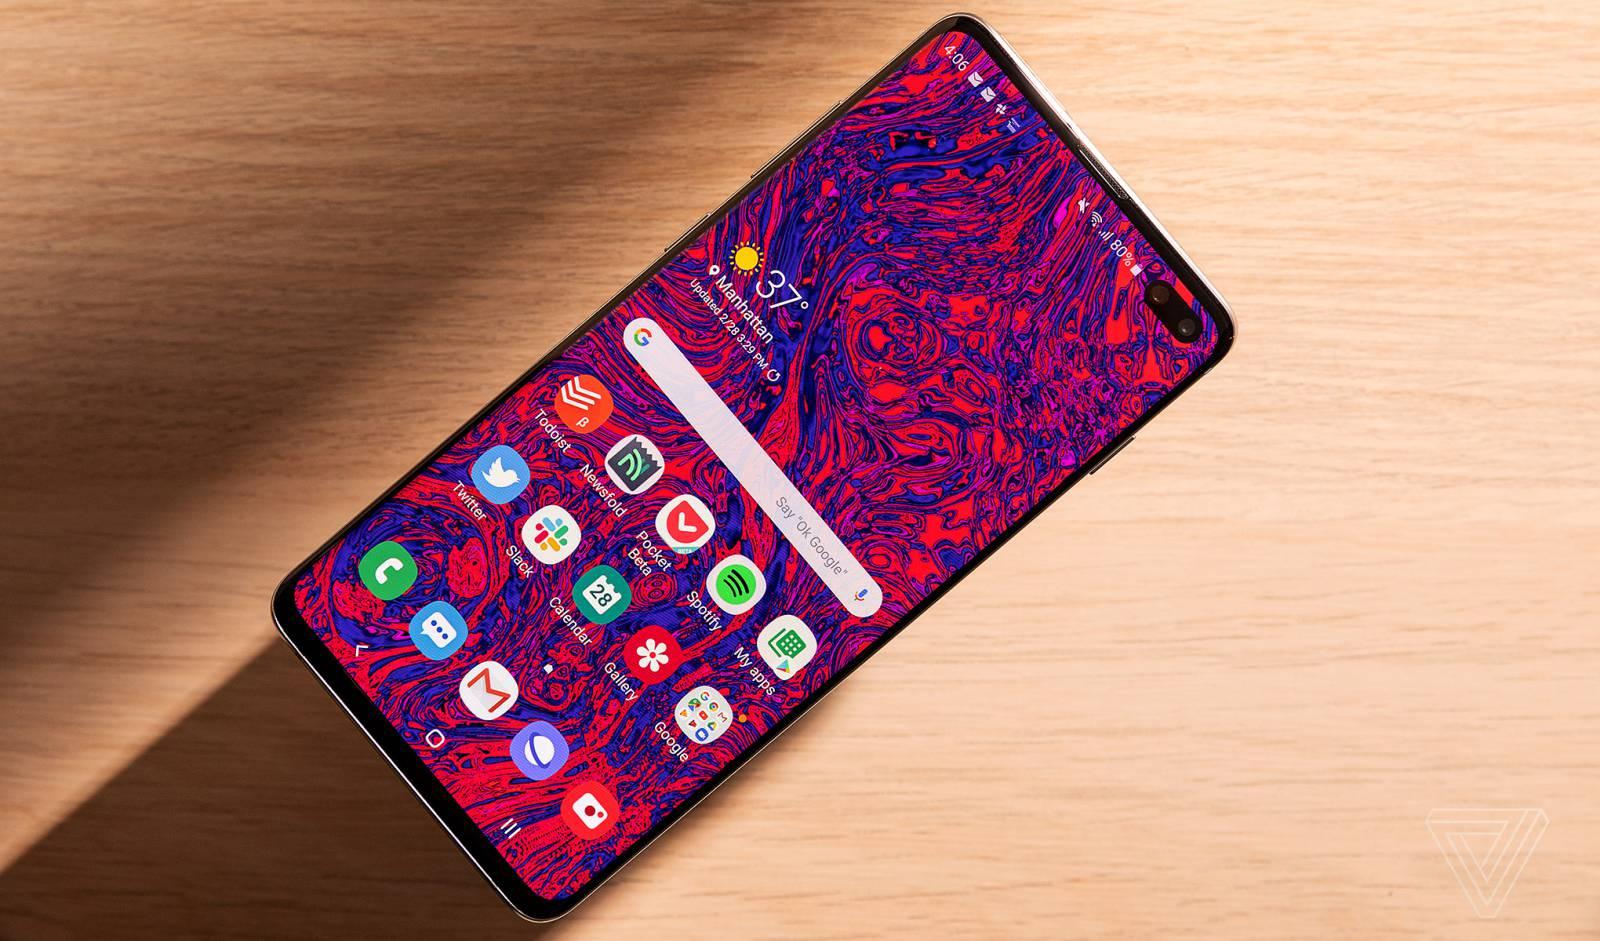 Samsung GALAXY S10 profit